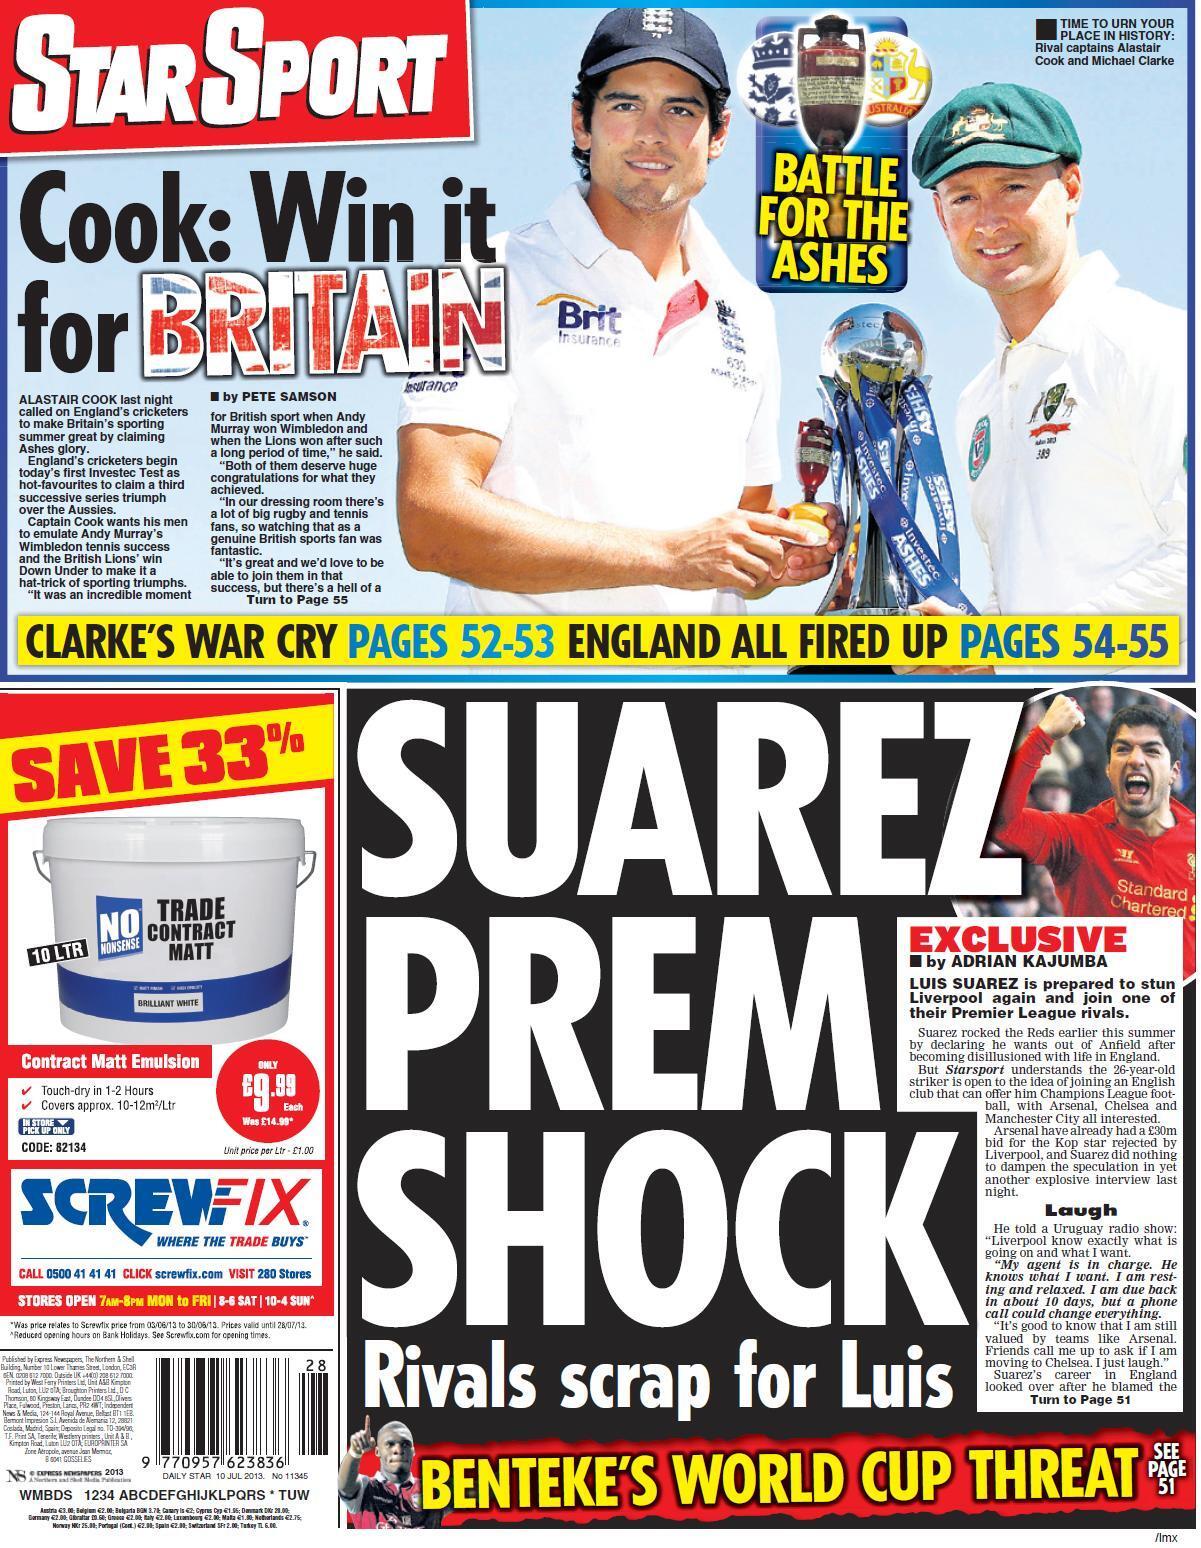 Arsenal, Chelsea & Man City chase Luis Suarez [Star]